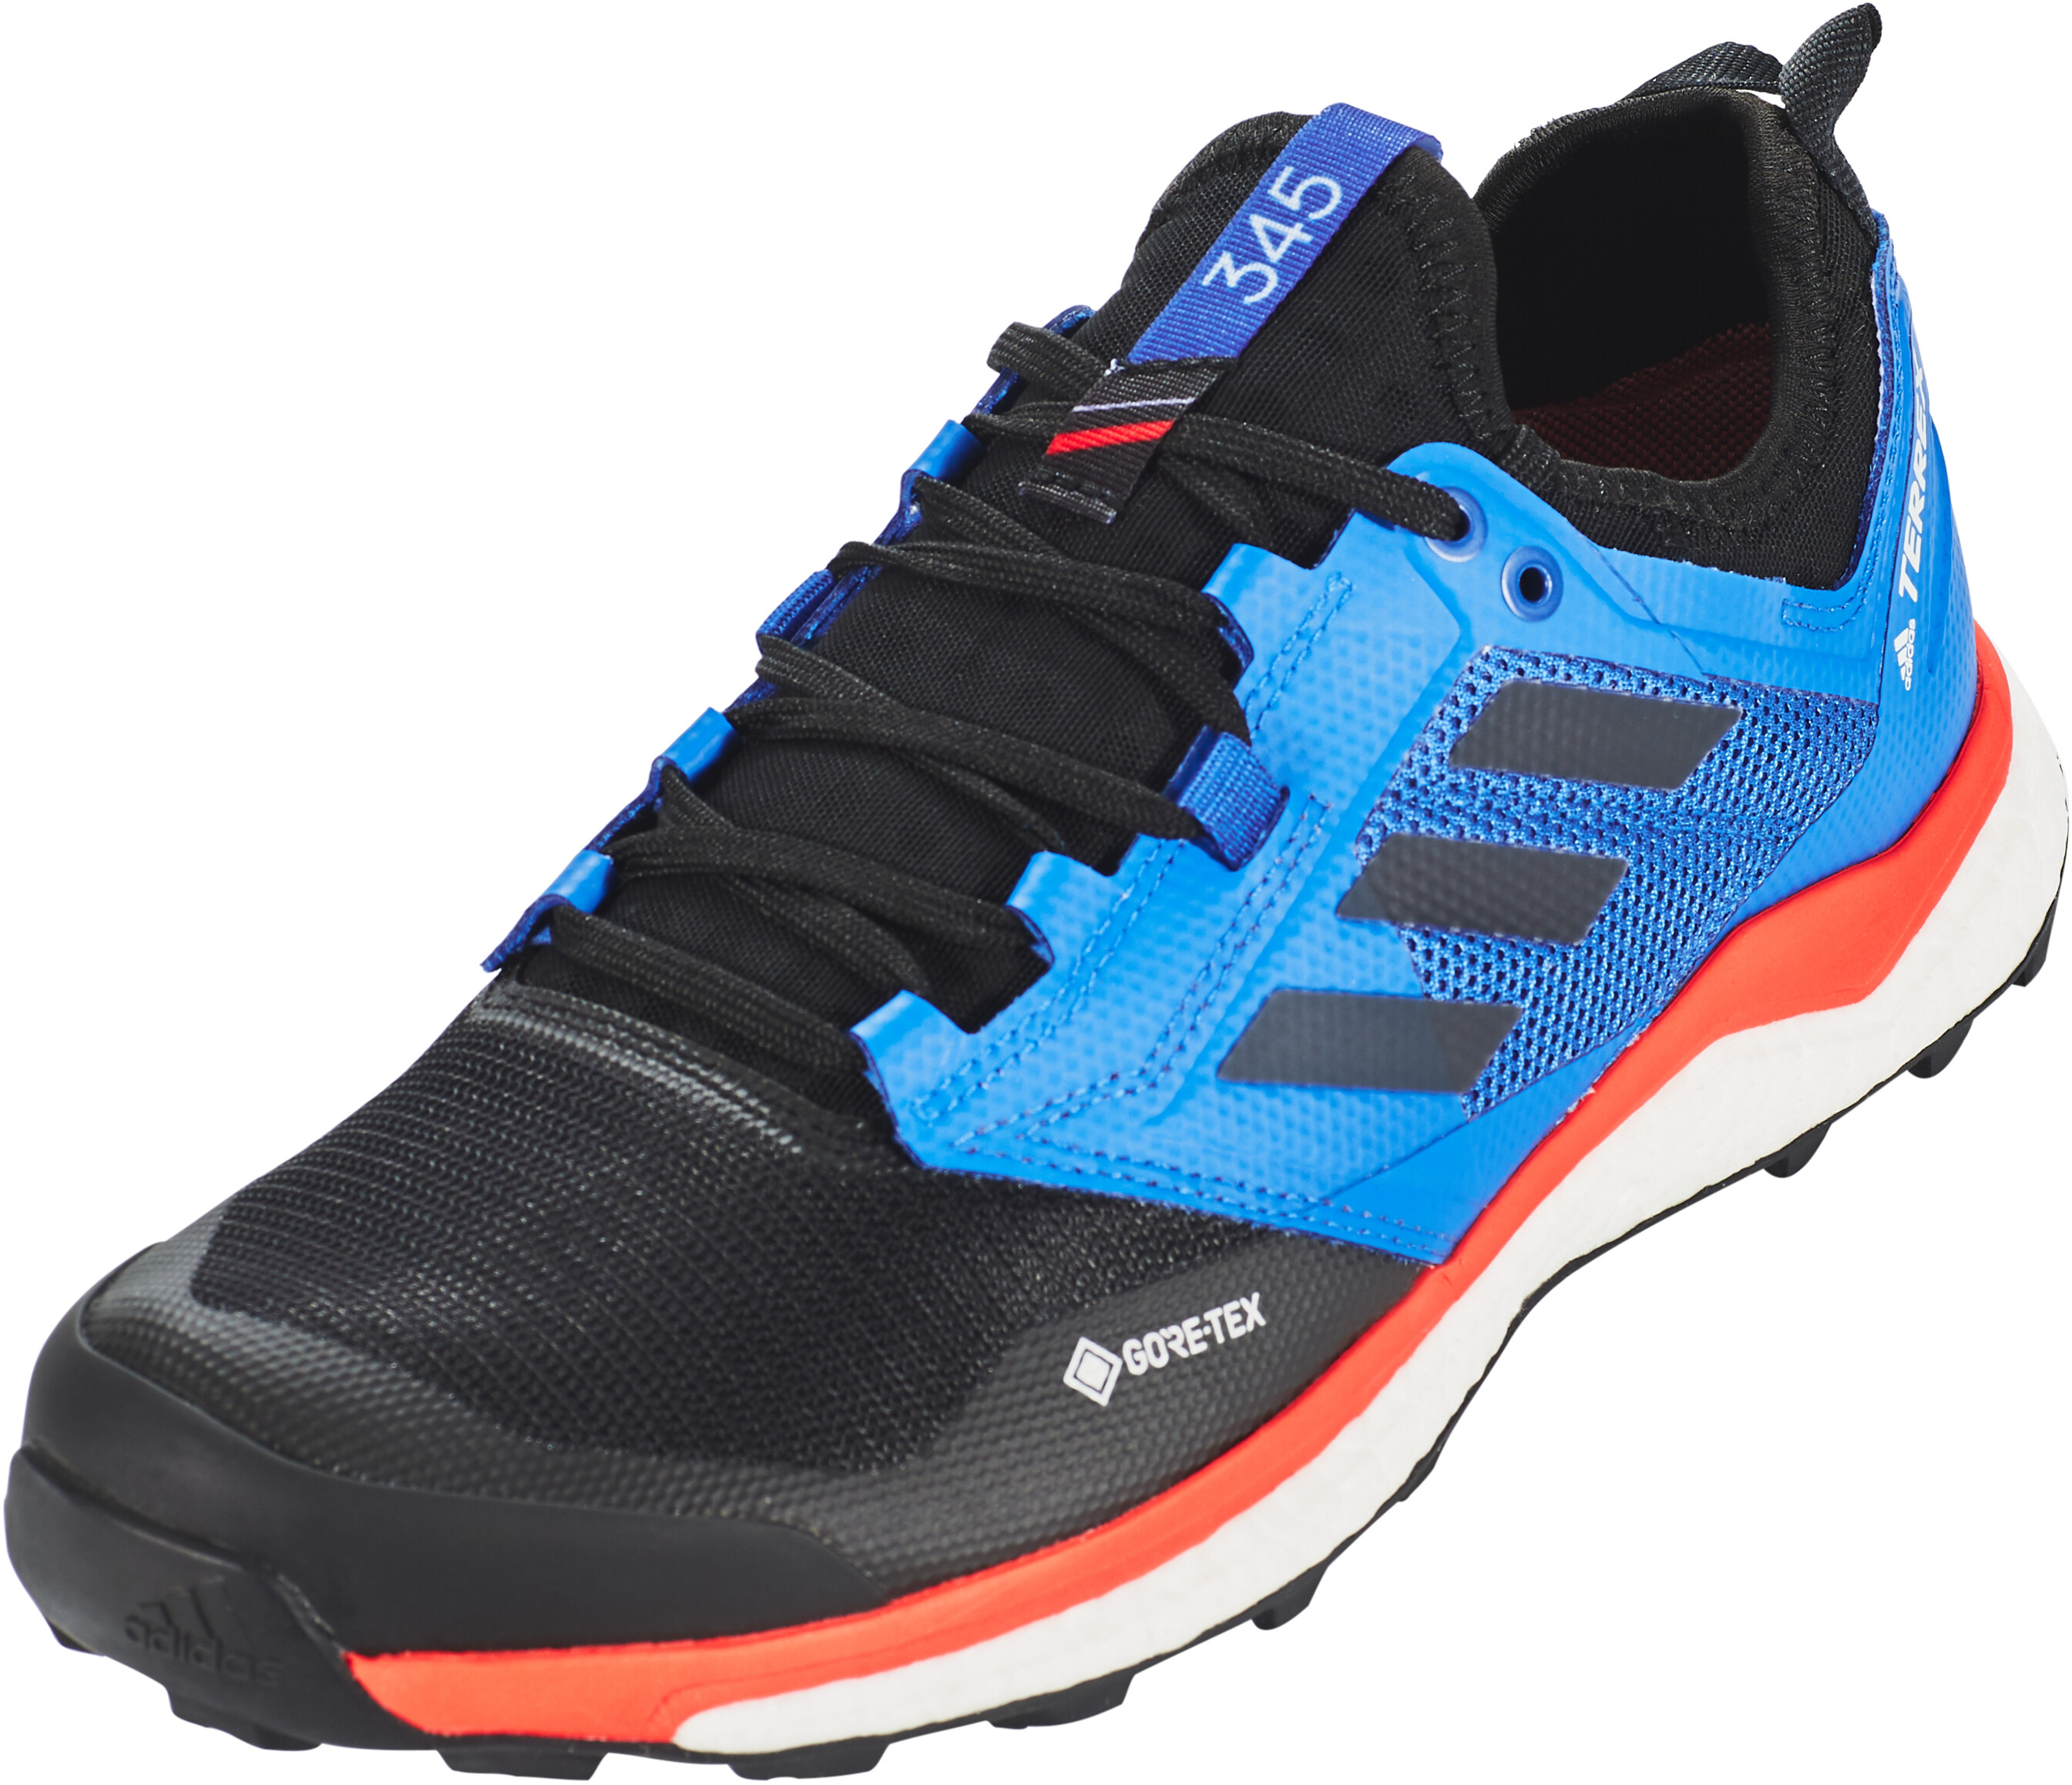 8bcfe559b adidas TERREX Agravic XT GTX Shoes Men core black/core black/blue beauty